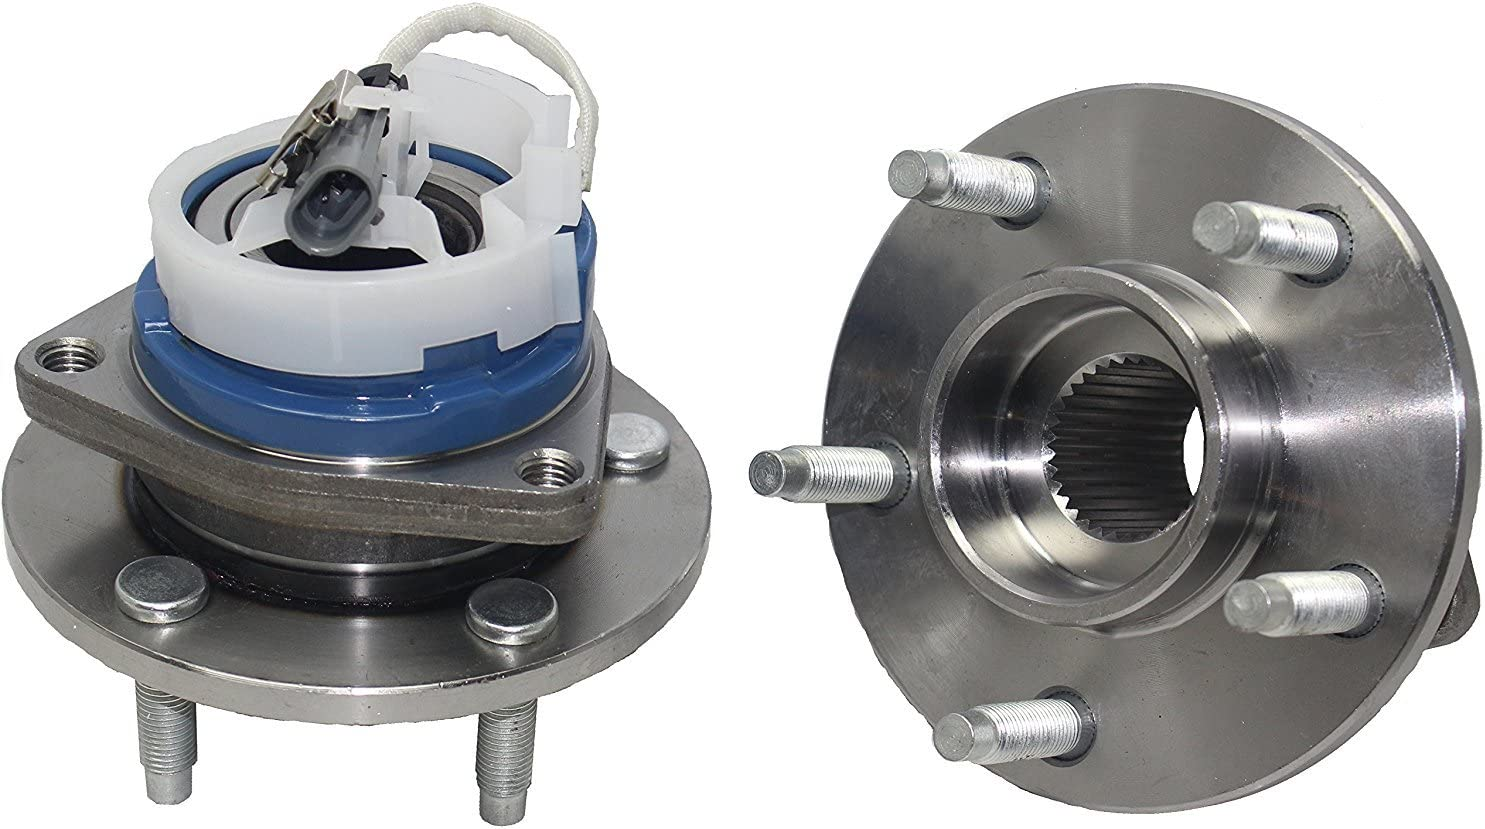 Rear Wheel Bearing /& Seal 2000-2013 CHEVROLET SUBURBAN 1500 PAIR New Axle Only